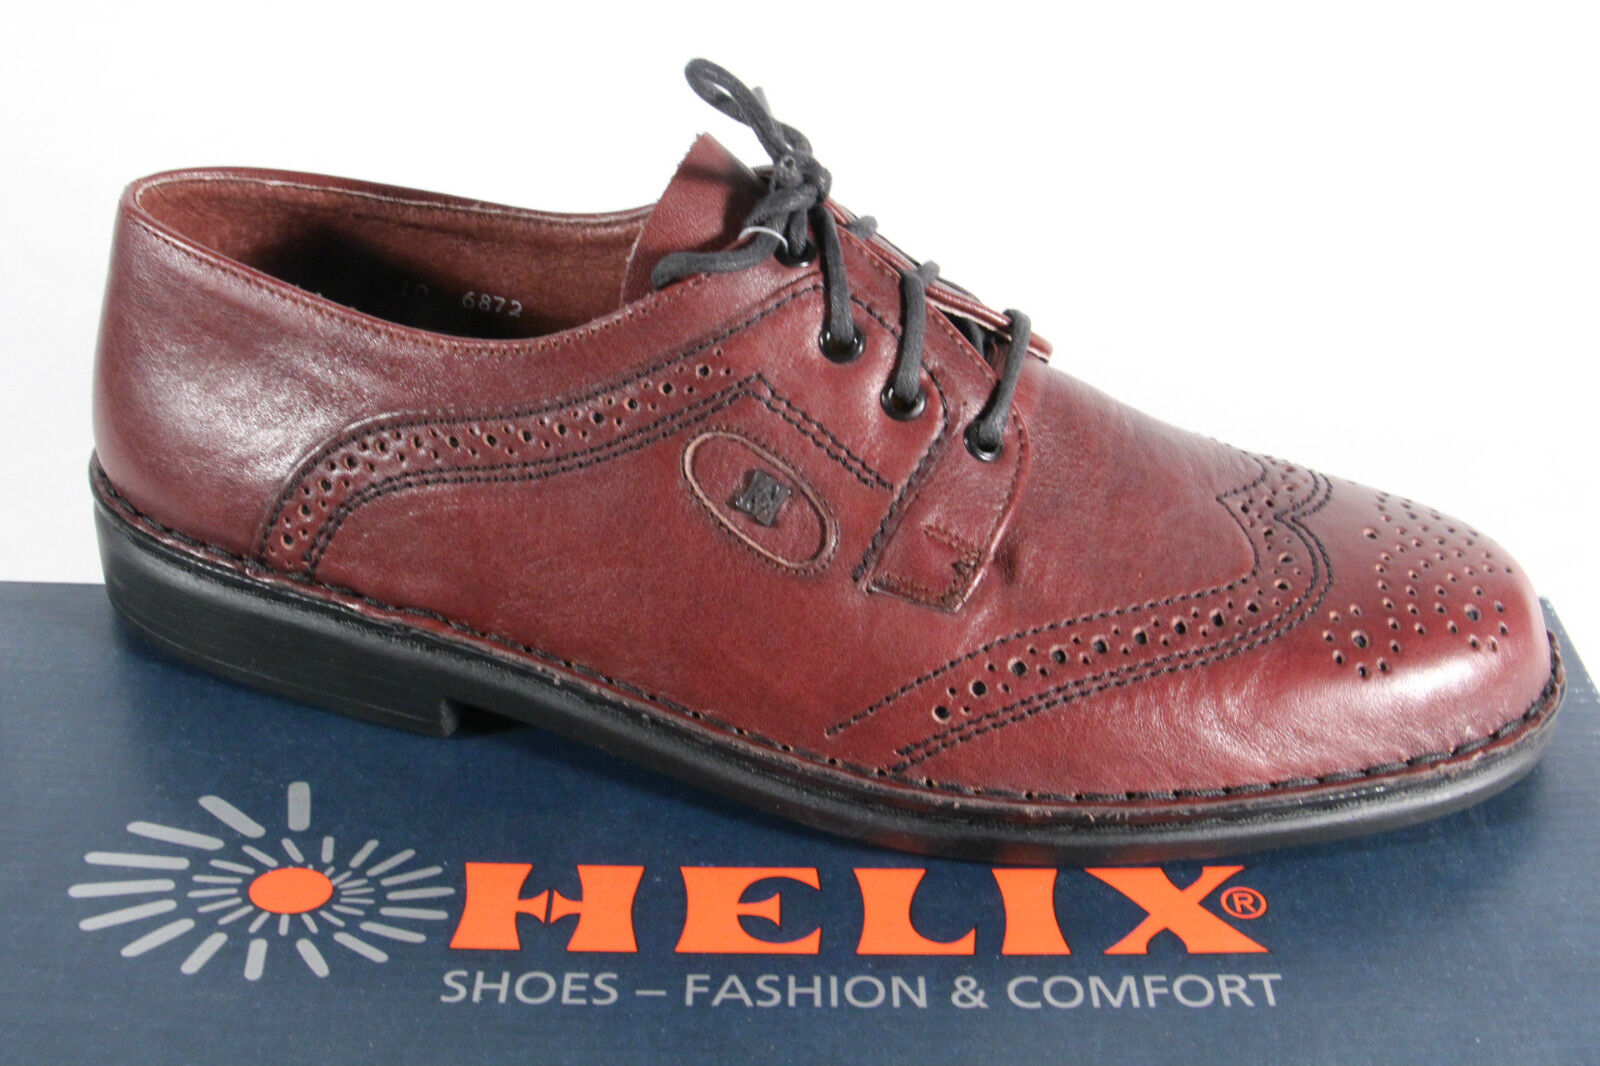 Helix Star Walker Herren Schnürschuh, Halbschuh Sneaker rotbraun,  NEU! NEU! NEU! b0c70f